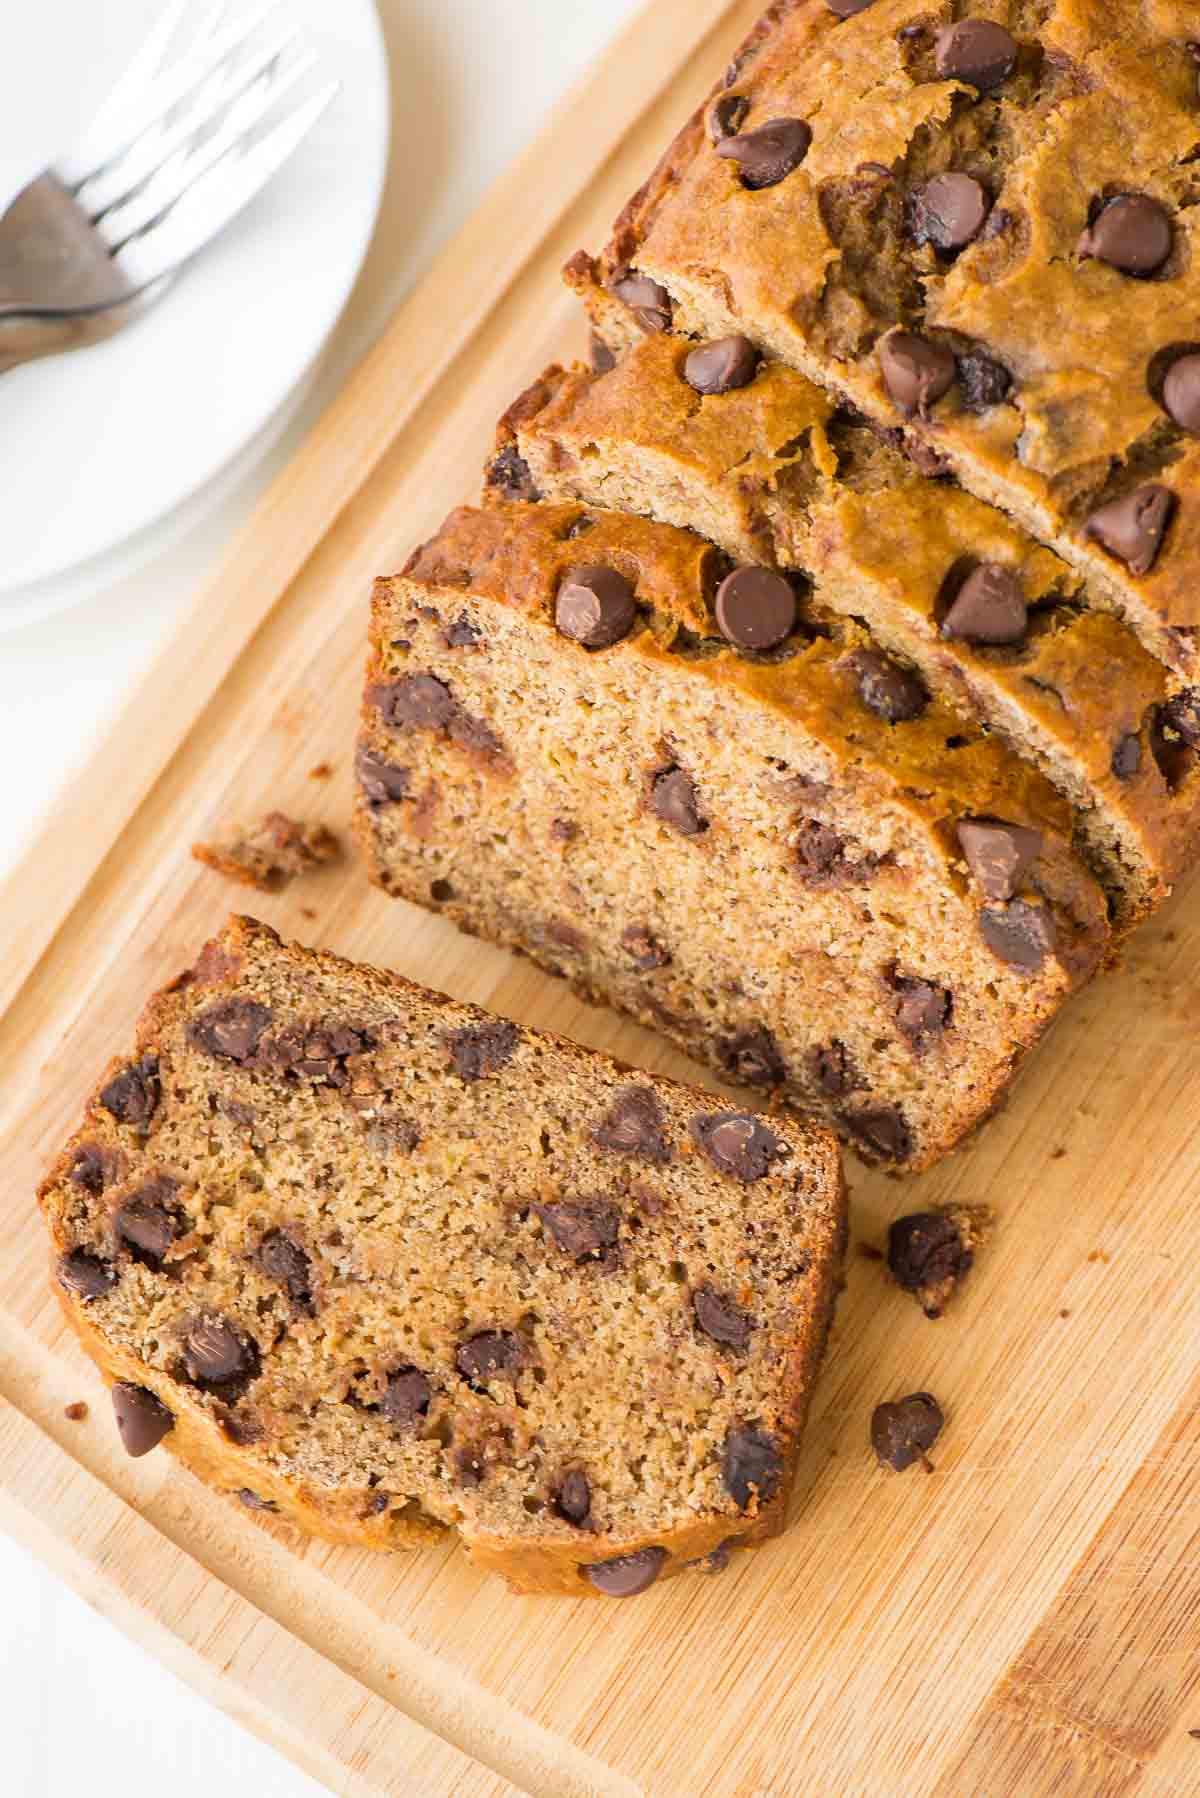 Healthy Bread Recipe  Healthy Banana Bread Recipe with Chocolate Chips